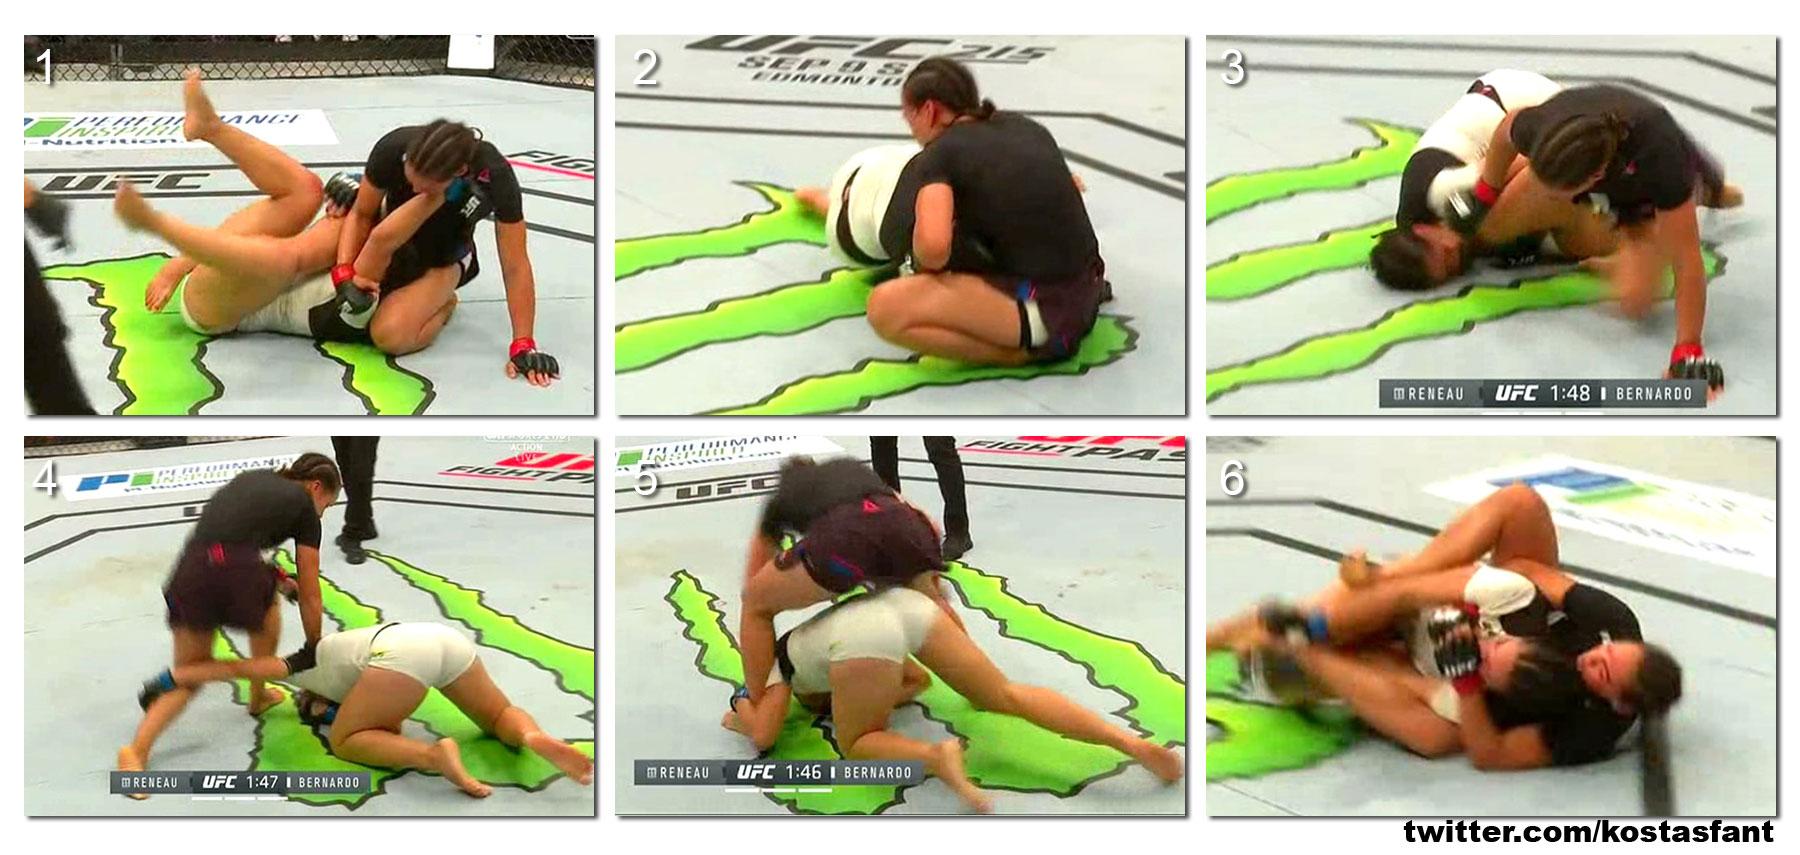 Marion Reneau vs Talita Bernardo